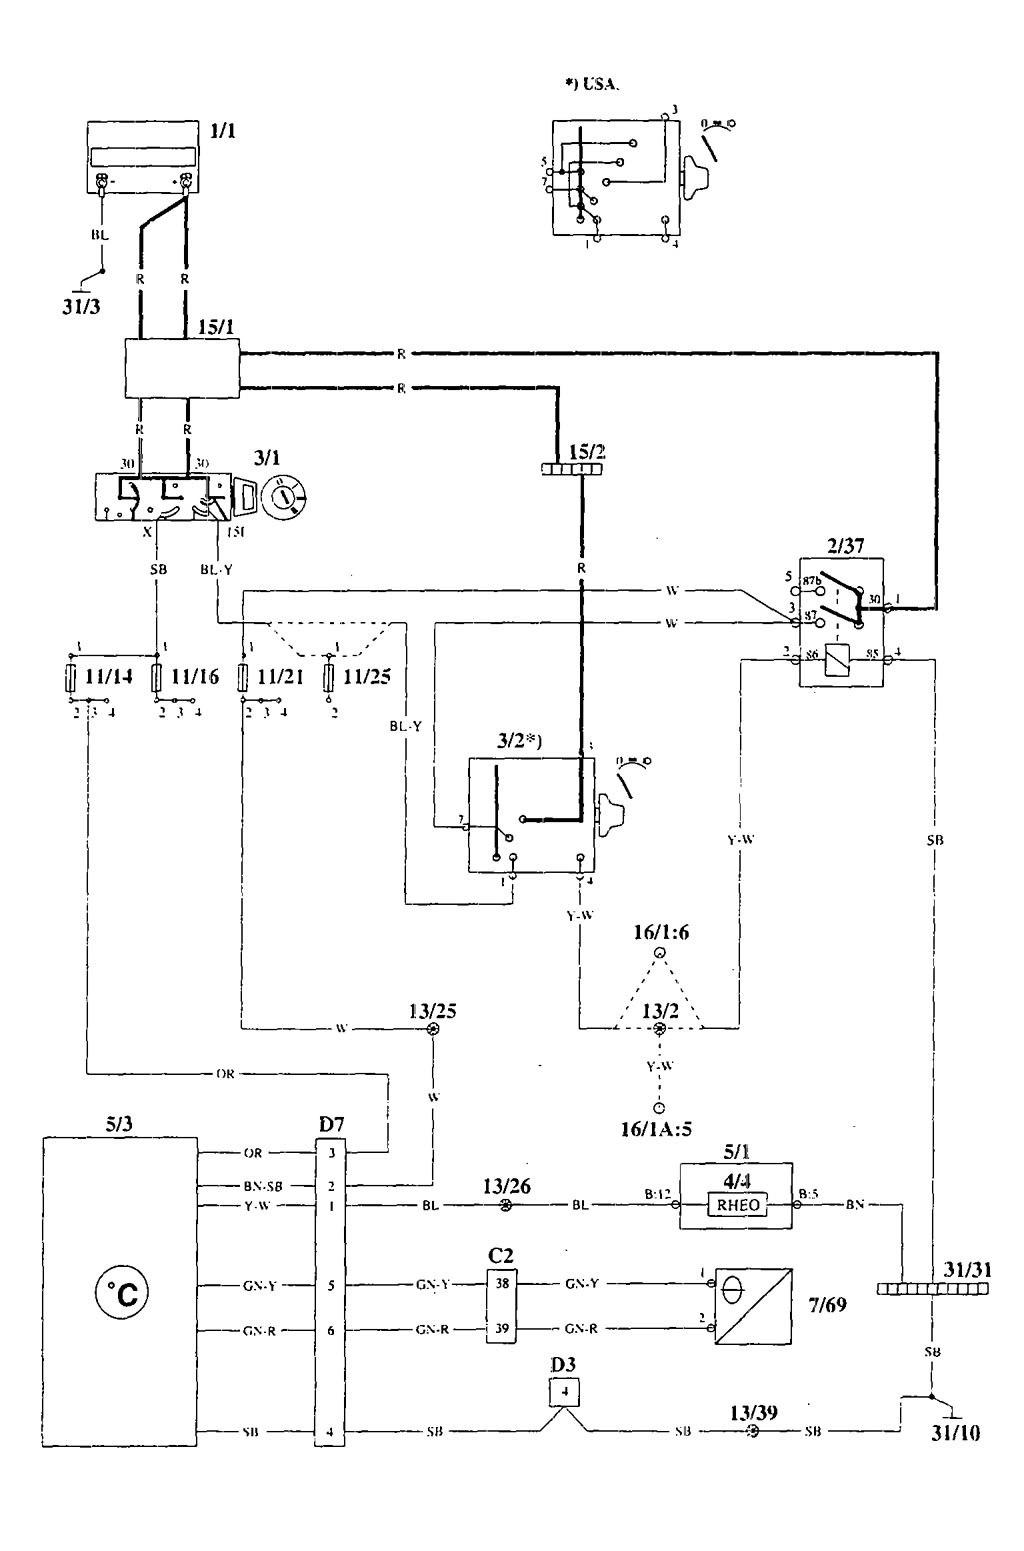 1991 volvo 940 stereo wiring diagram citroen berlingo 1995 diagrams electronic compass